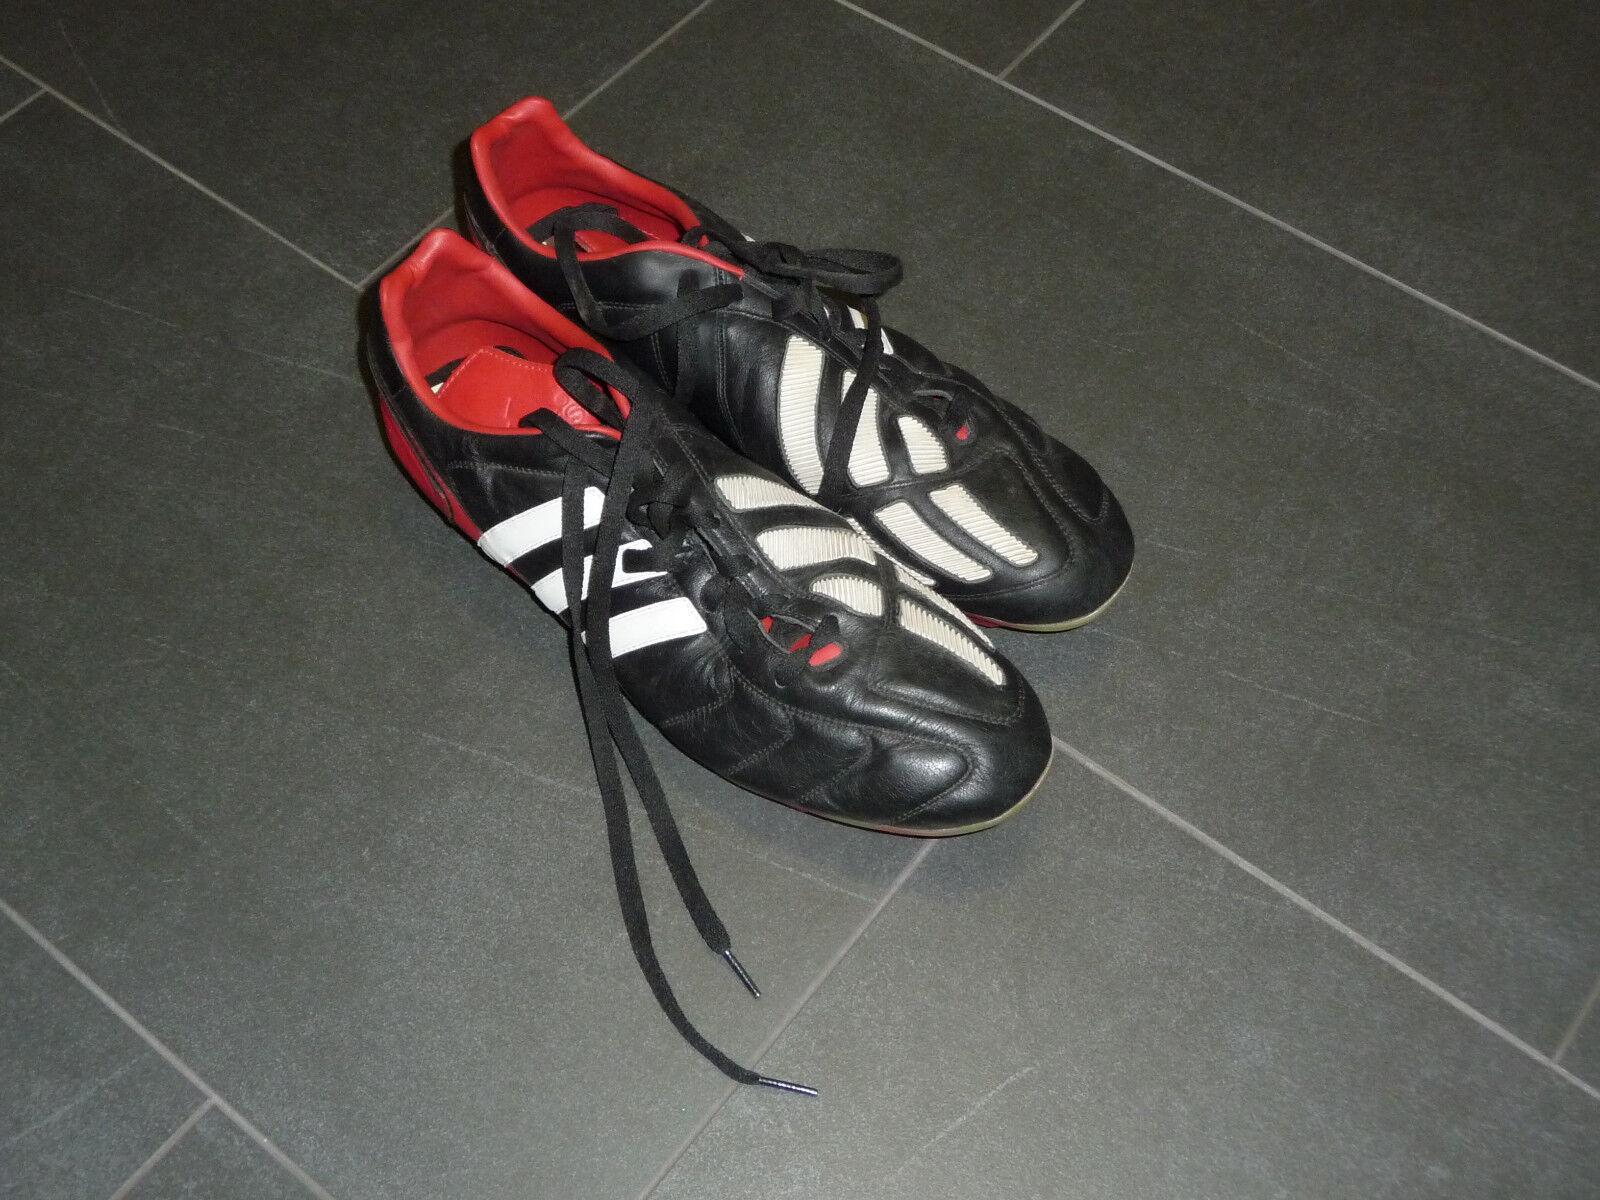 Fußballschuhe Schuhe von Adidas Protator SPG SPG SPG 753 UK 13 schwarz bca305